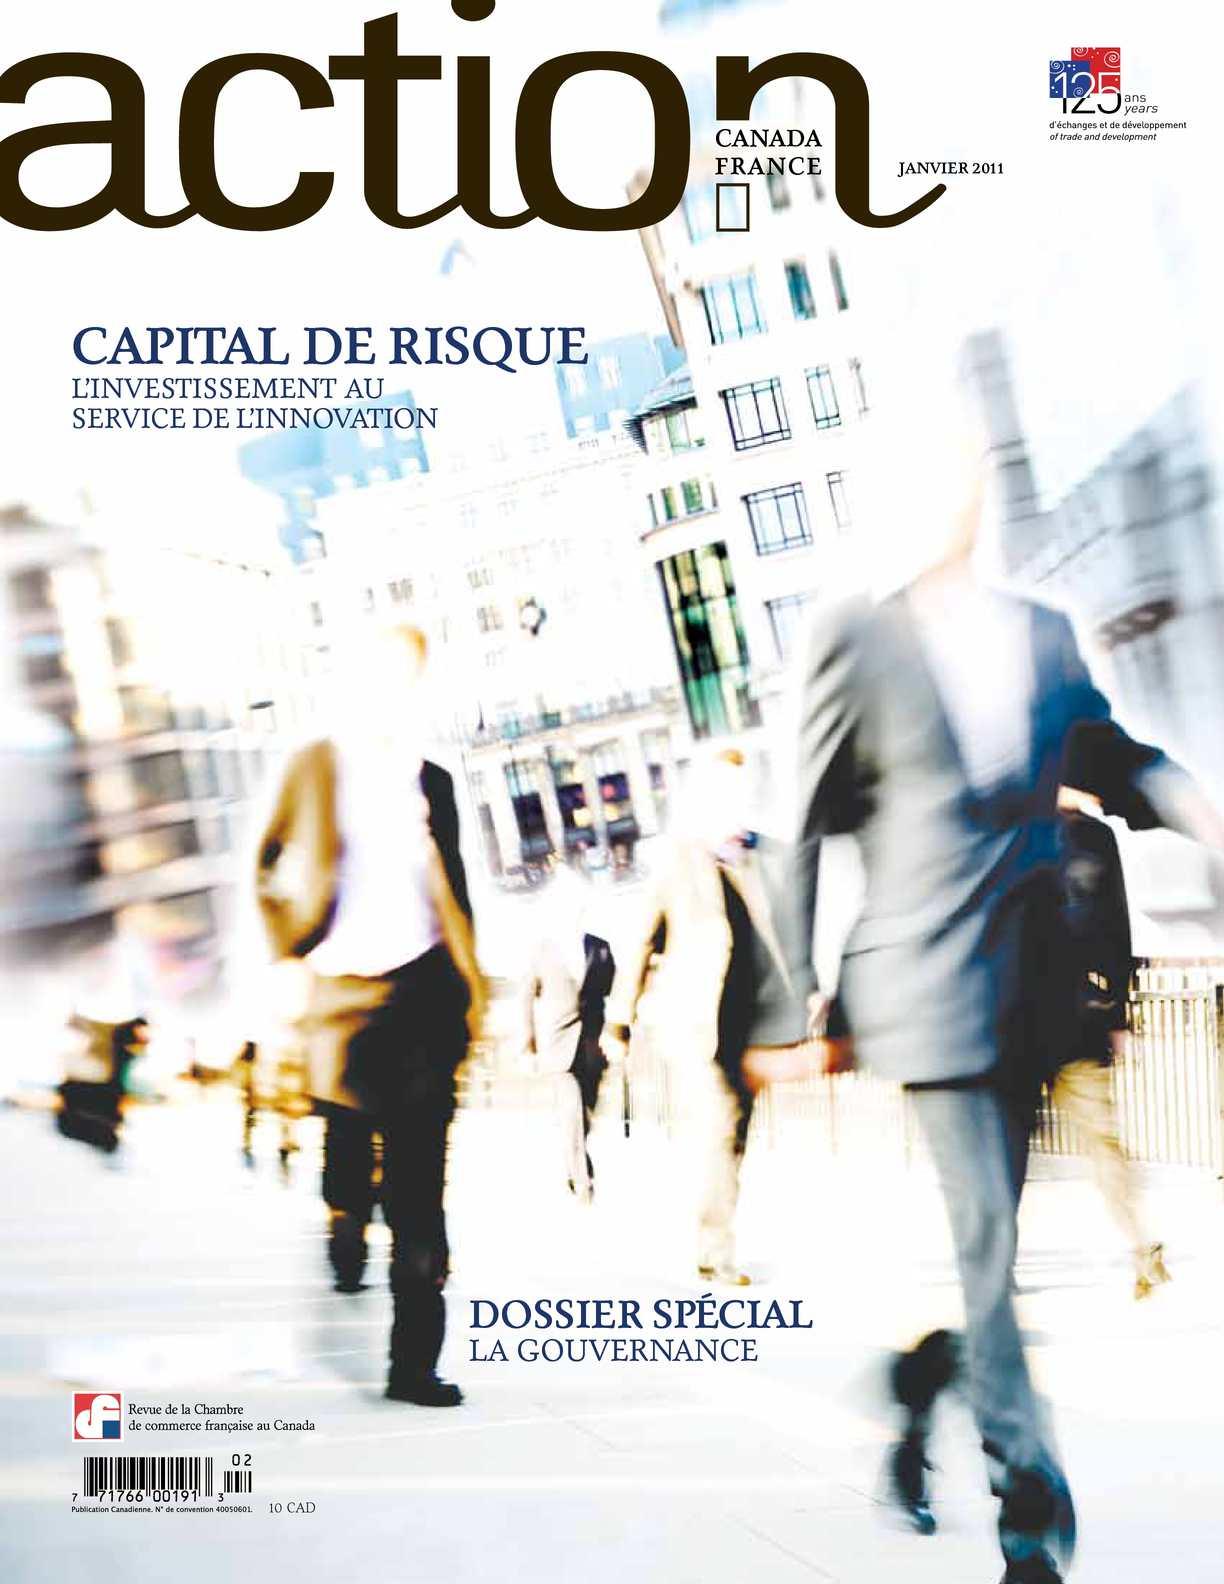 Calam o revue action canada france capital de risque for Chambre de commerce francaise au canada